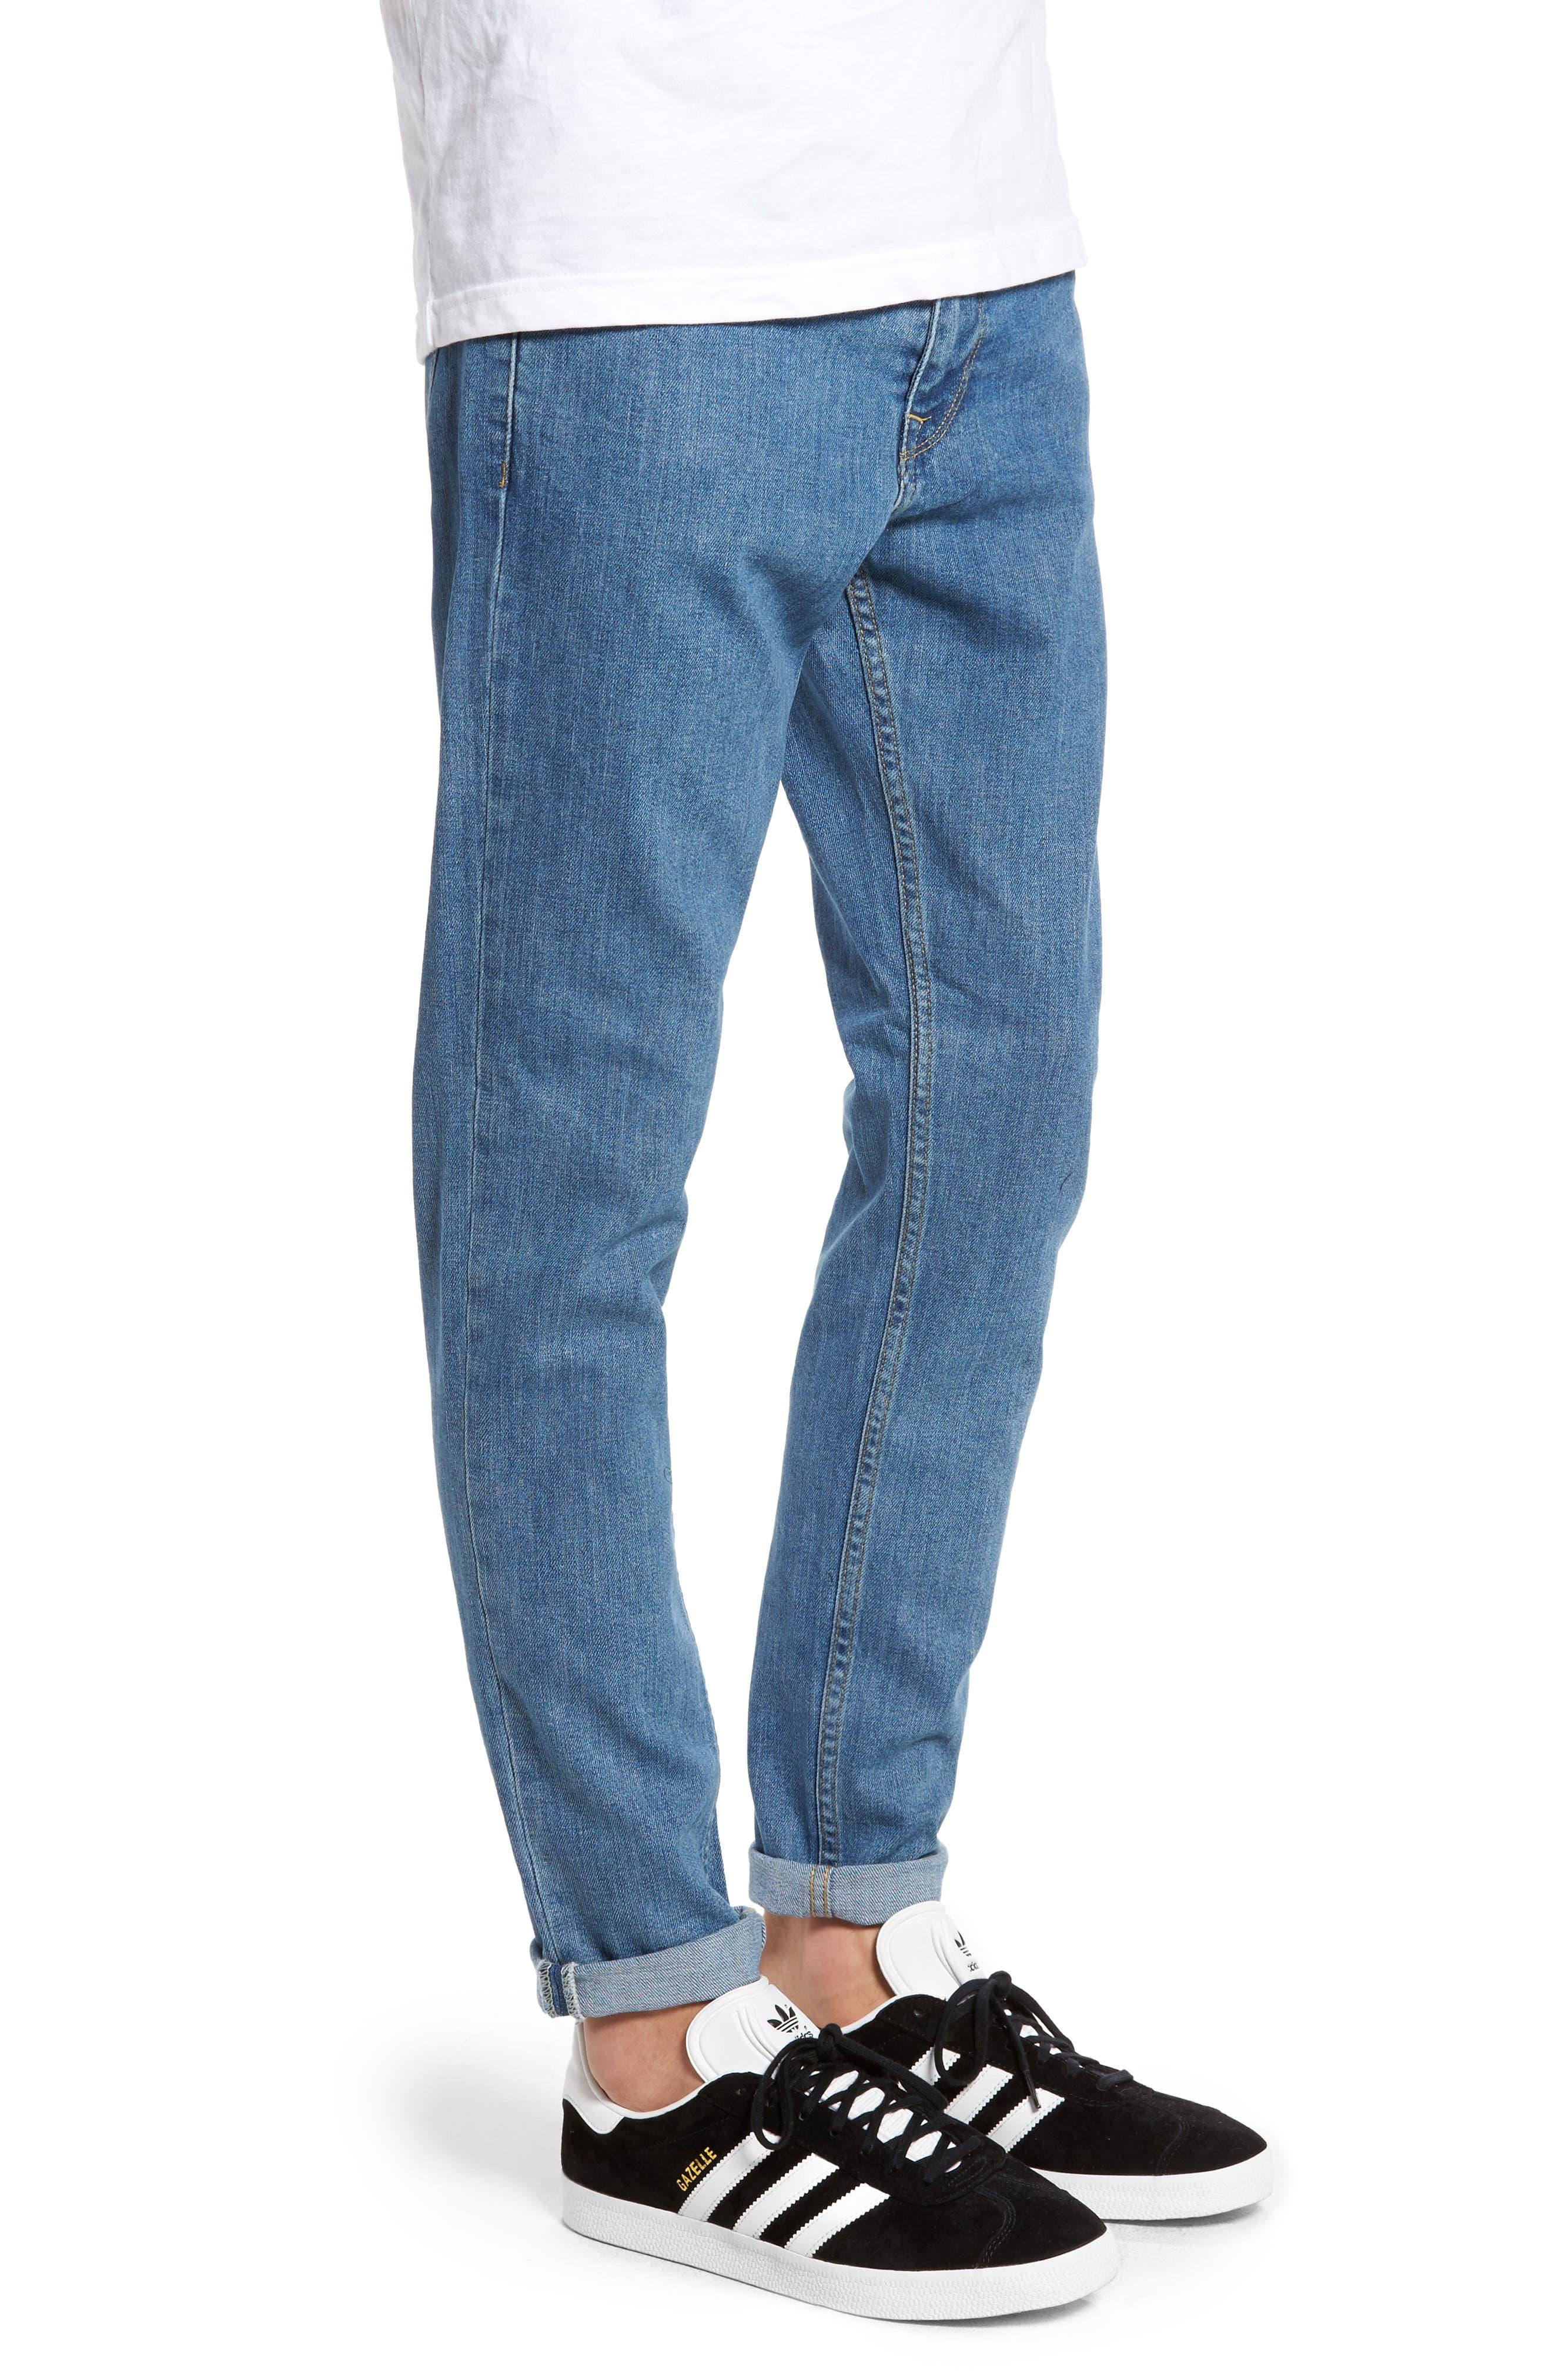 Clark Slim Straight Fit Jeans,                             Alternate thumbnail 3, color,